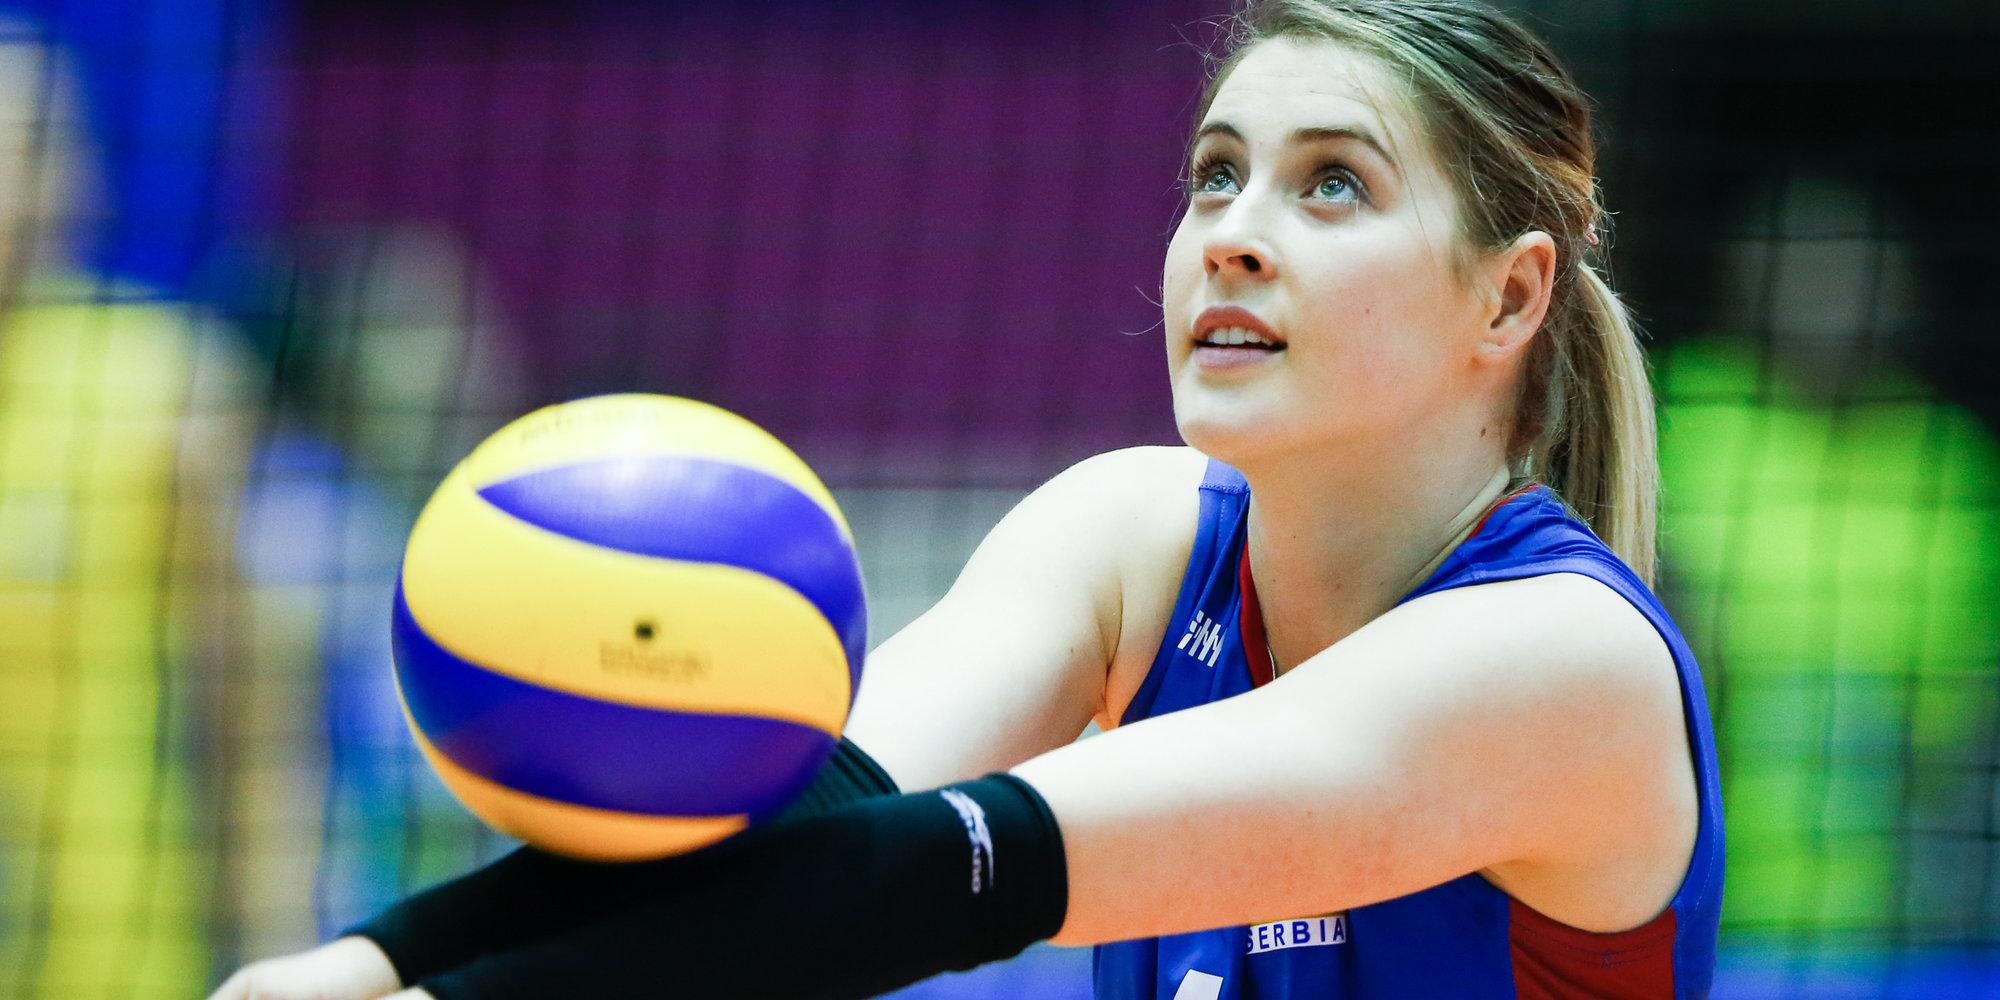 Сербские волейболистки победили Японию на Олимпиаде в Токио